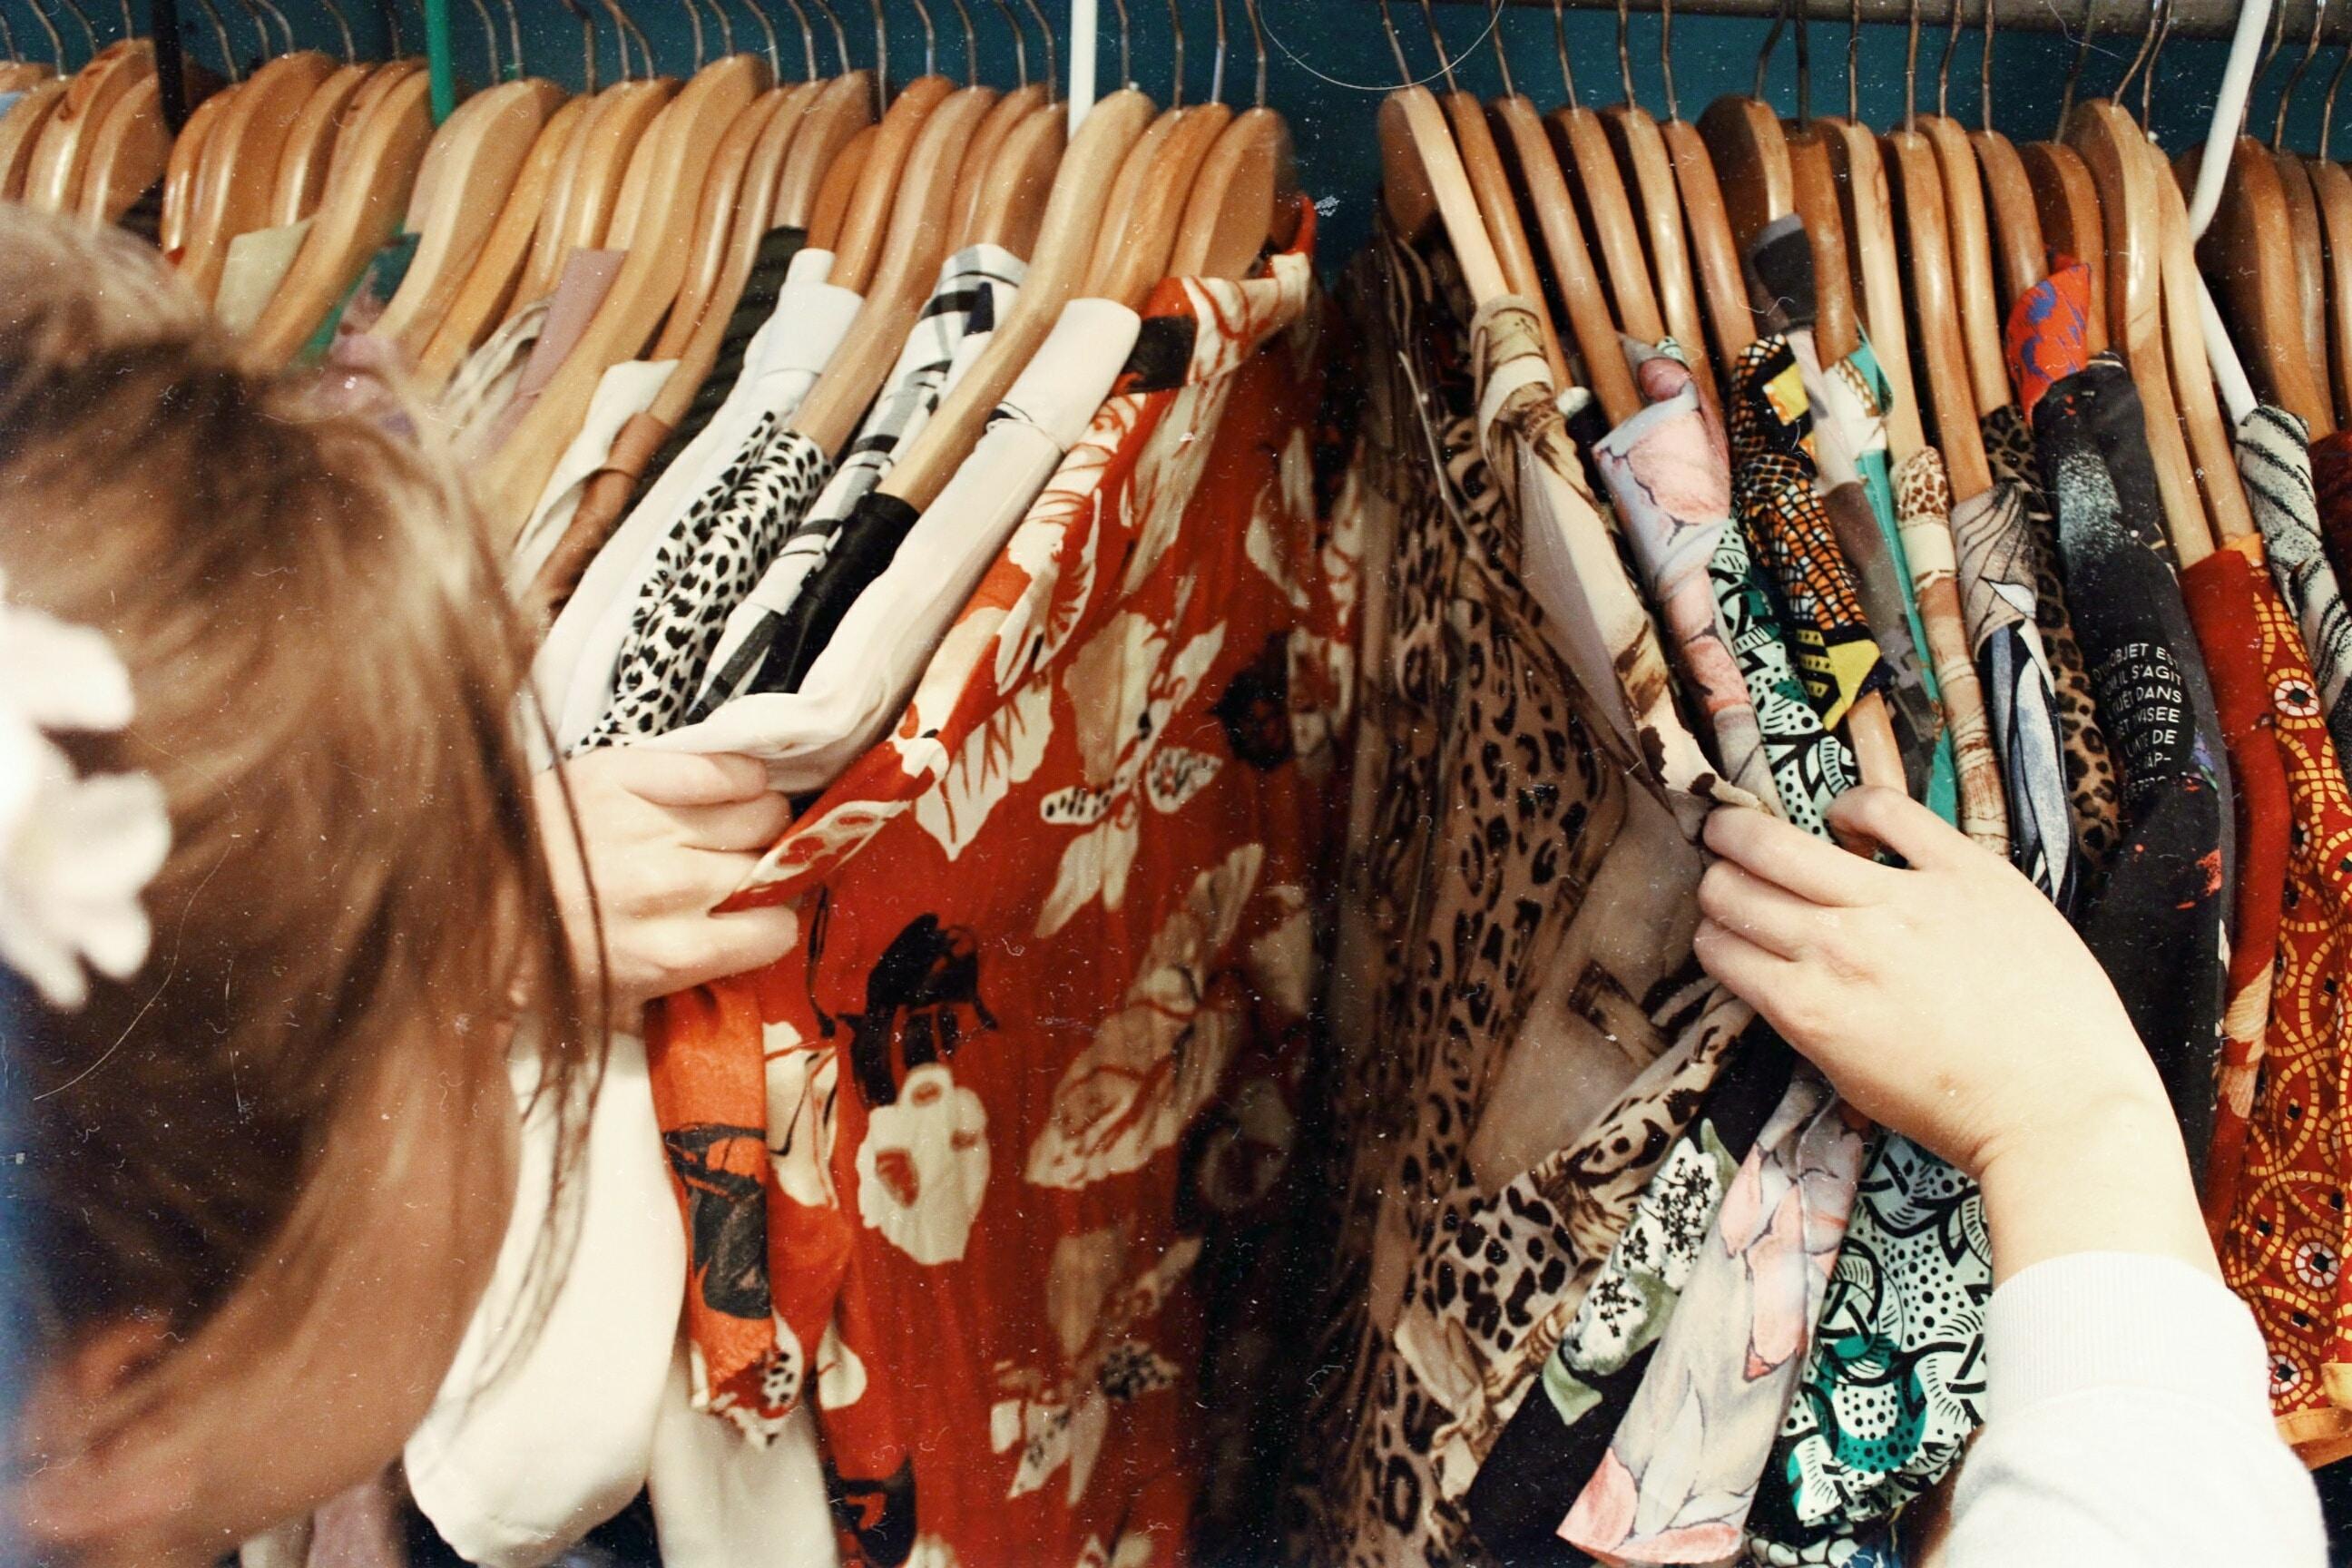 Musette, Braiconf, Venera Arapu si alte 11 branduri romanesti de fashion, la New York Women's Fashion. Programul, sustinut de stat cu 1 milion de lei